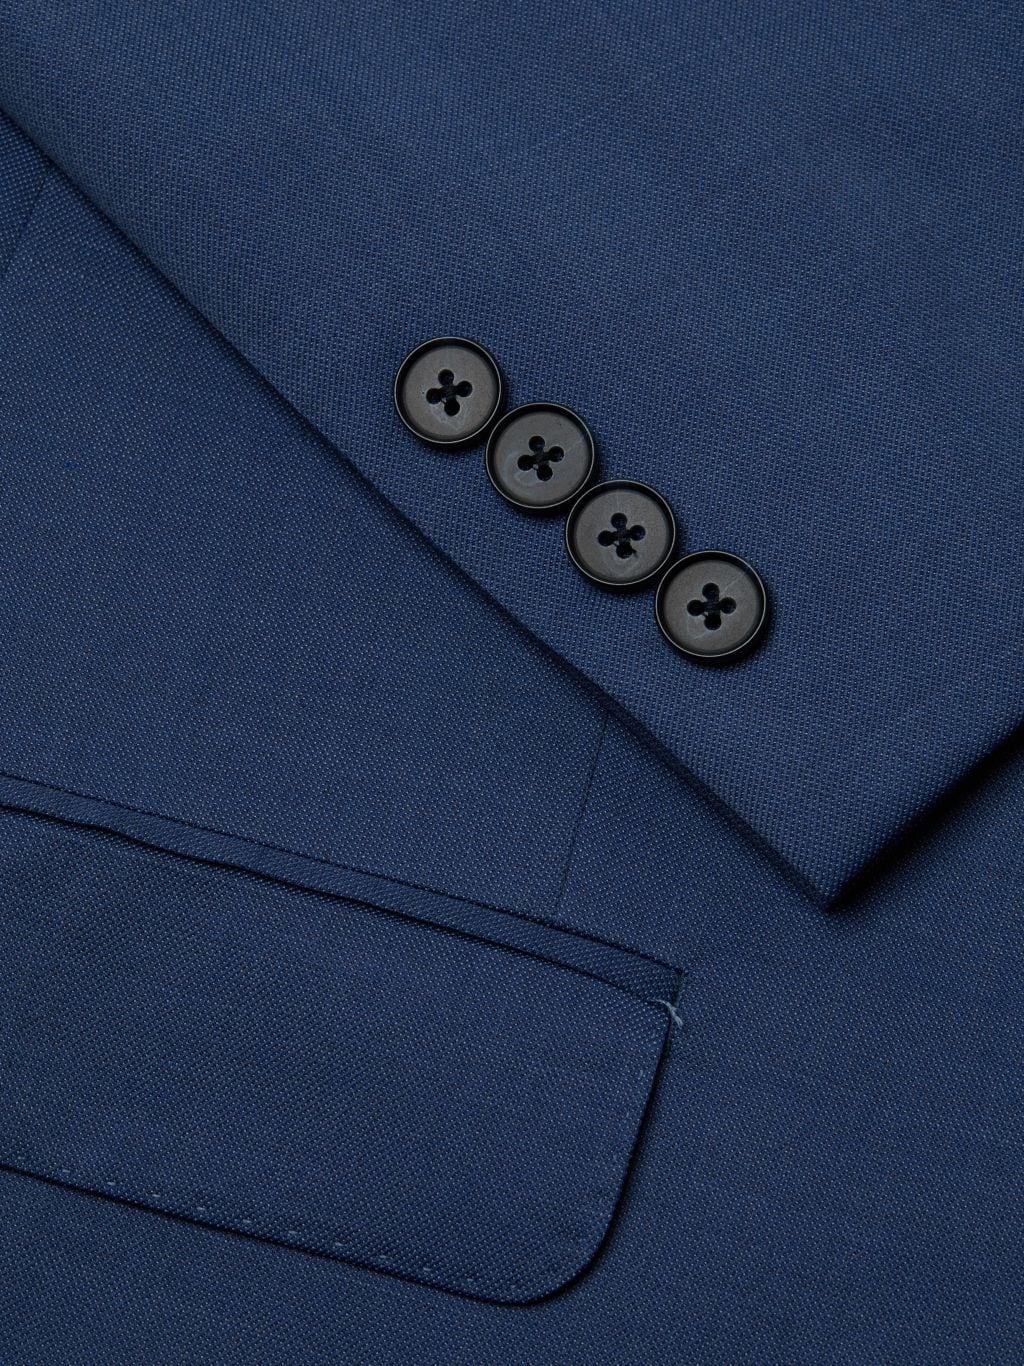 Calvin Klein Slim-Fit Textured Solid Wool-Blend Suit